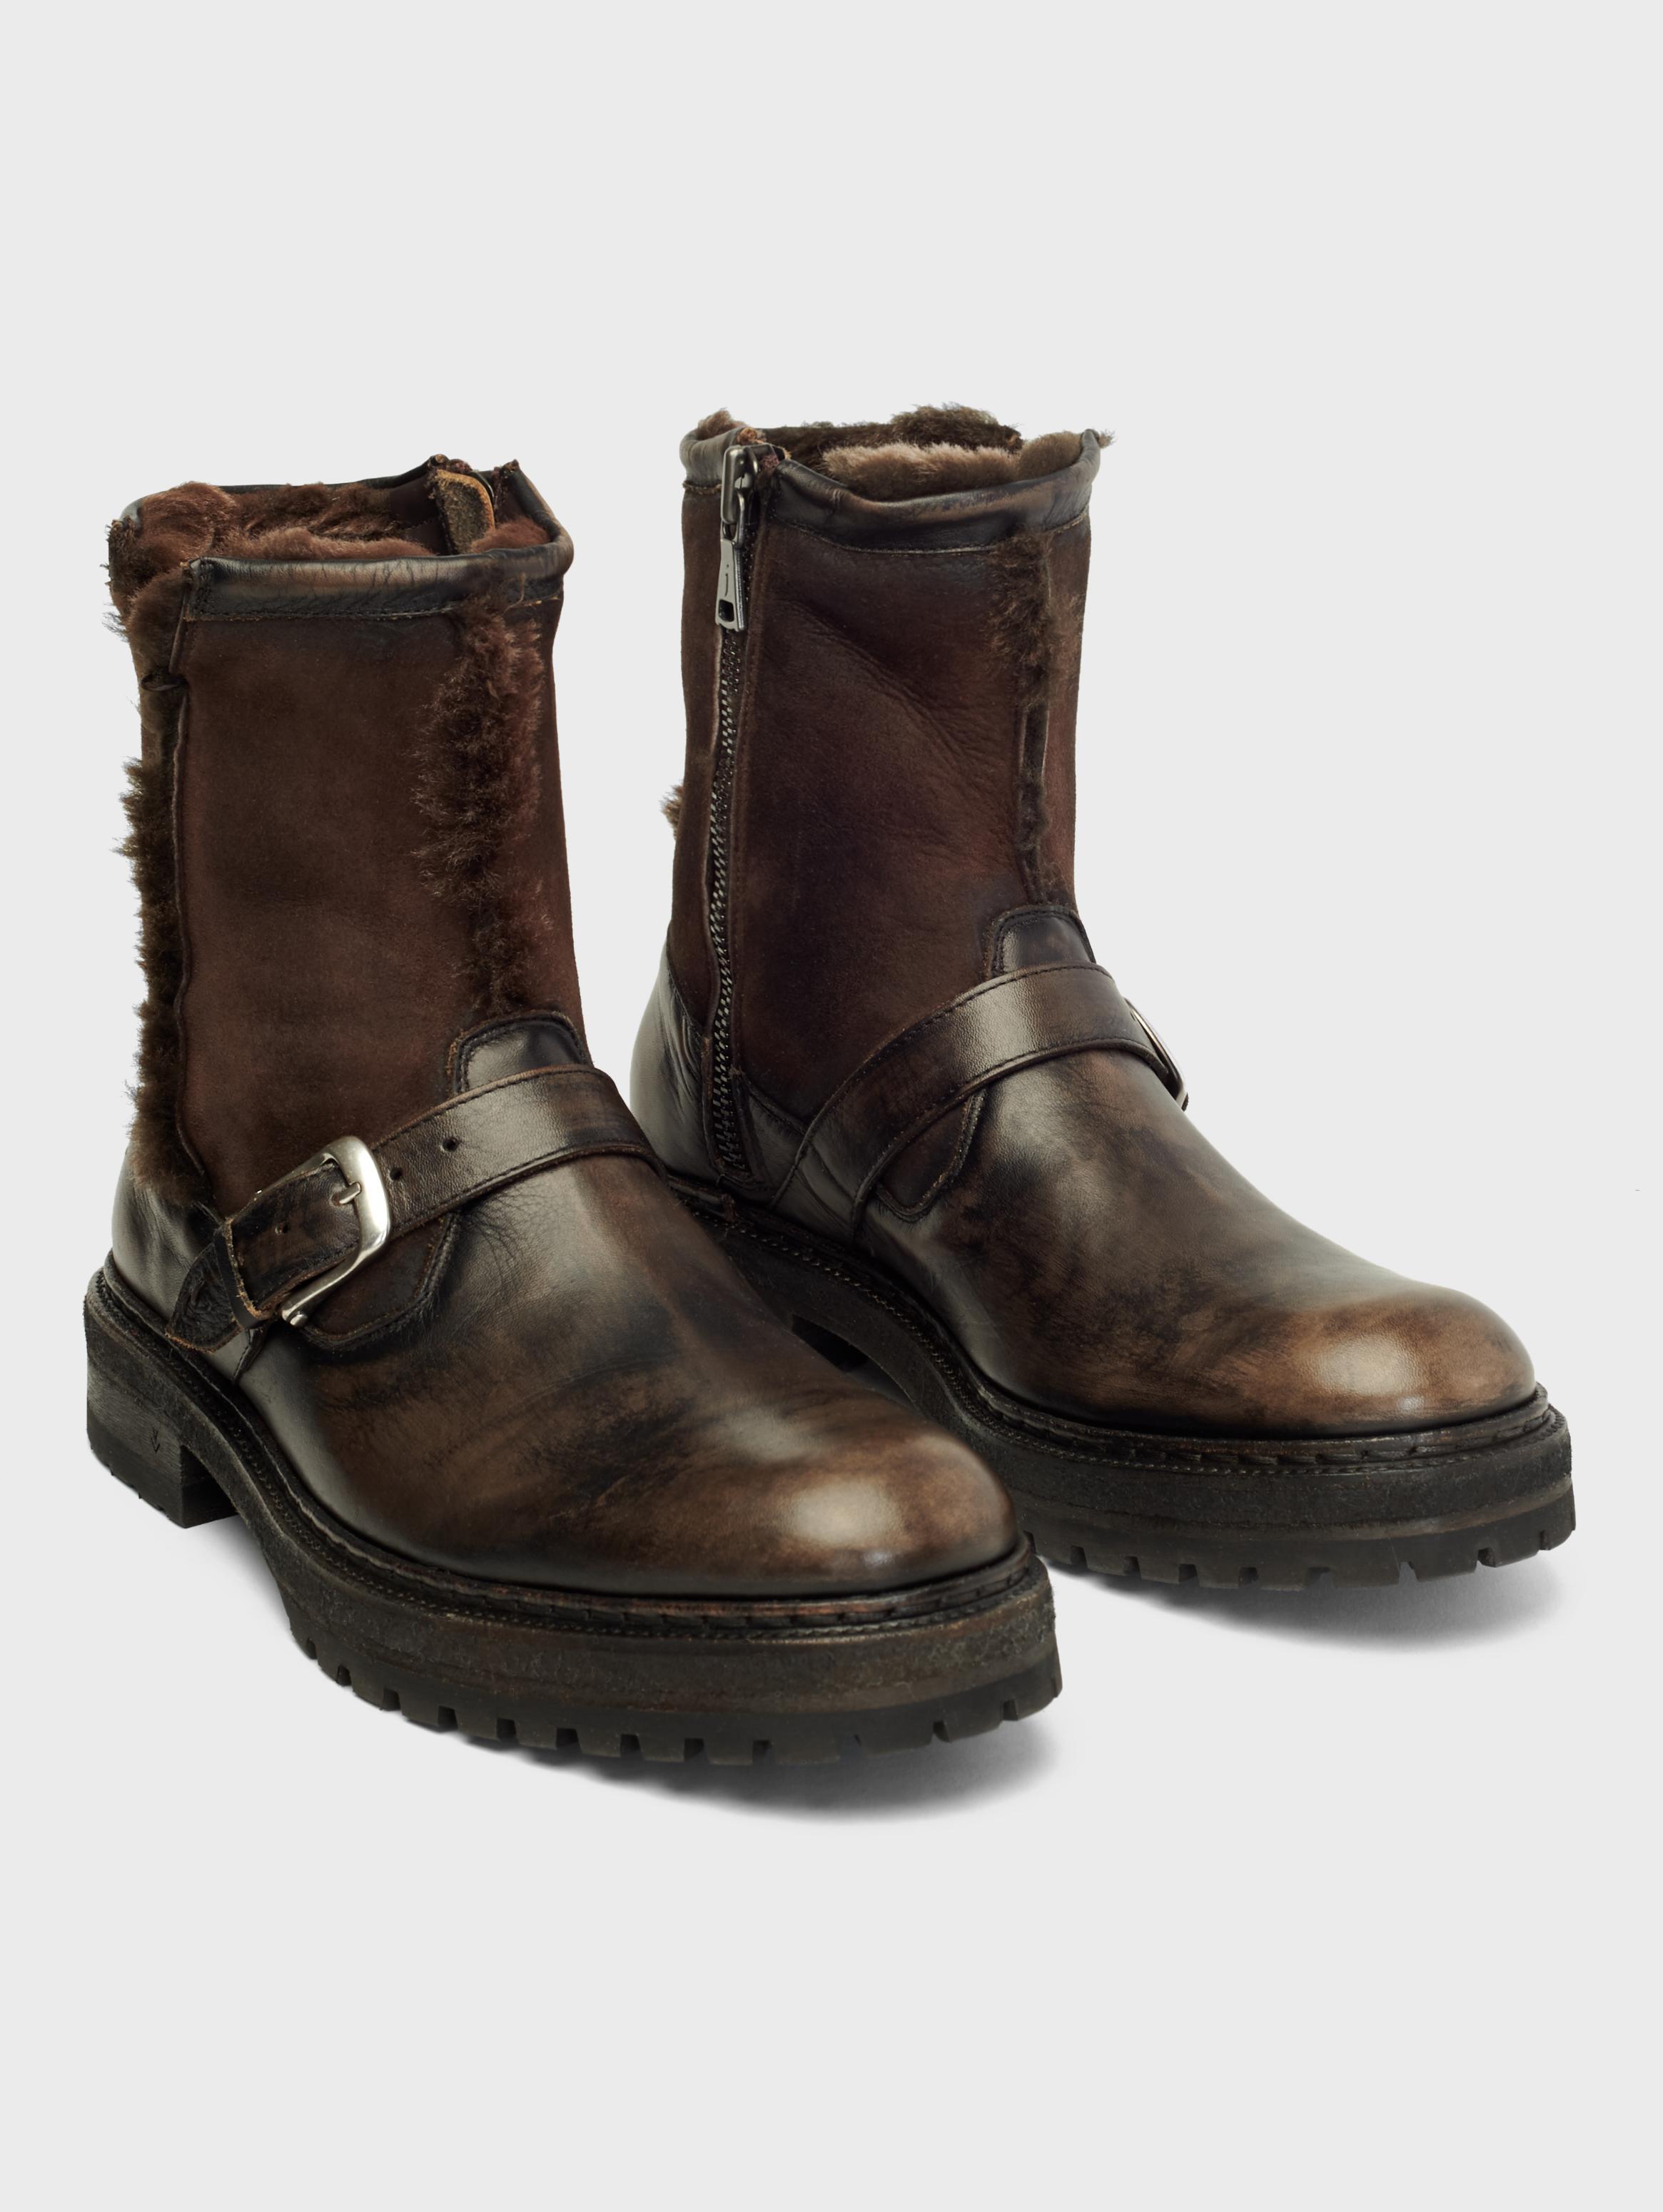 John Varvatos Union Shearling Moto Boots Walnut